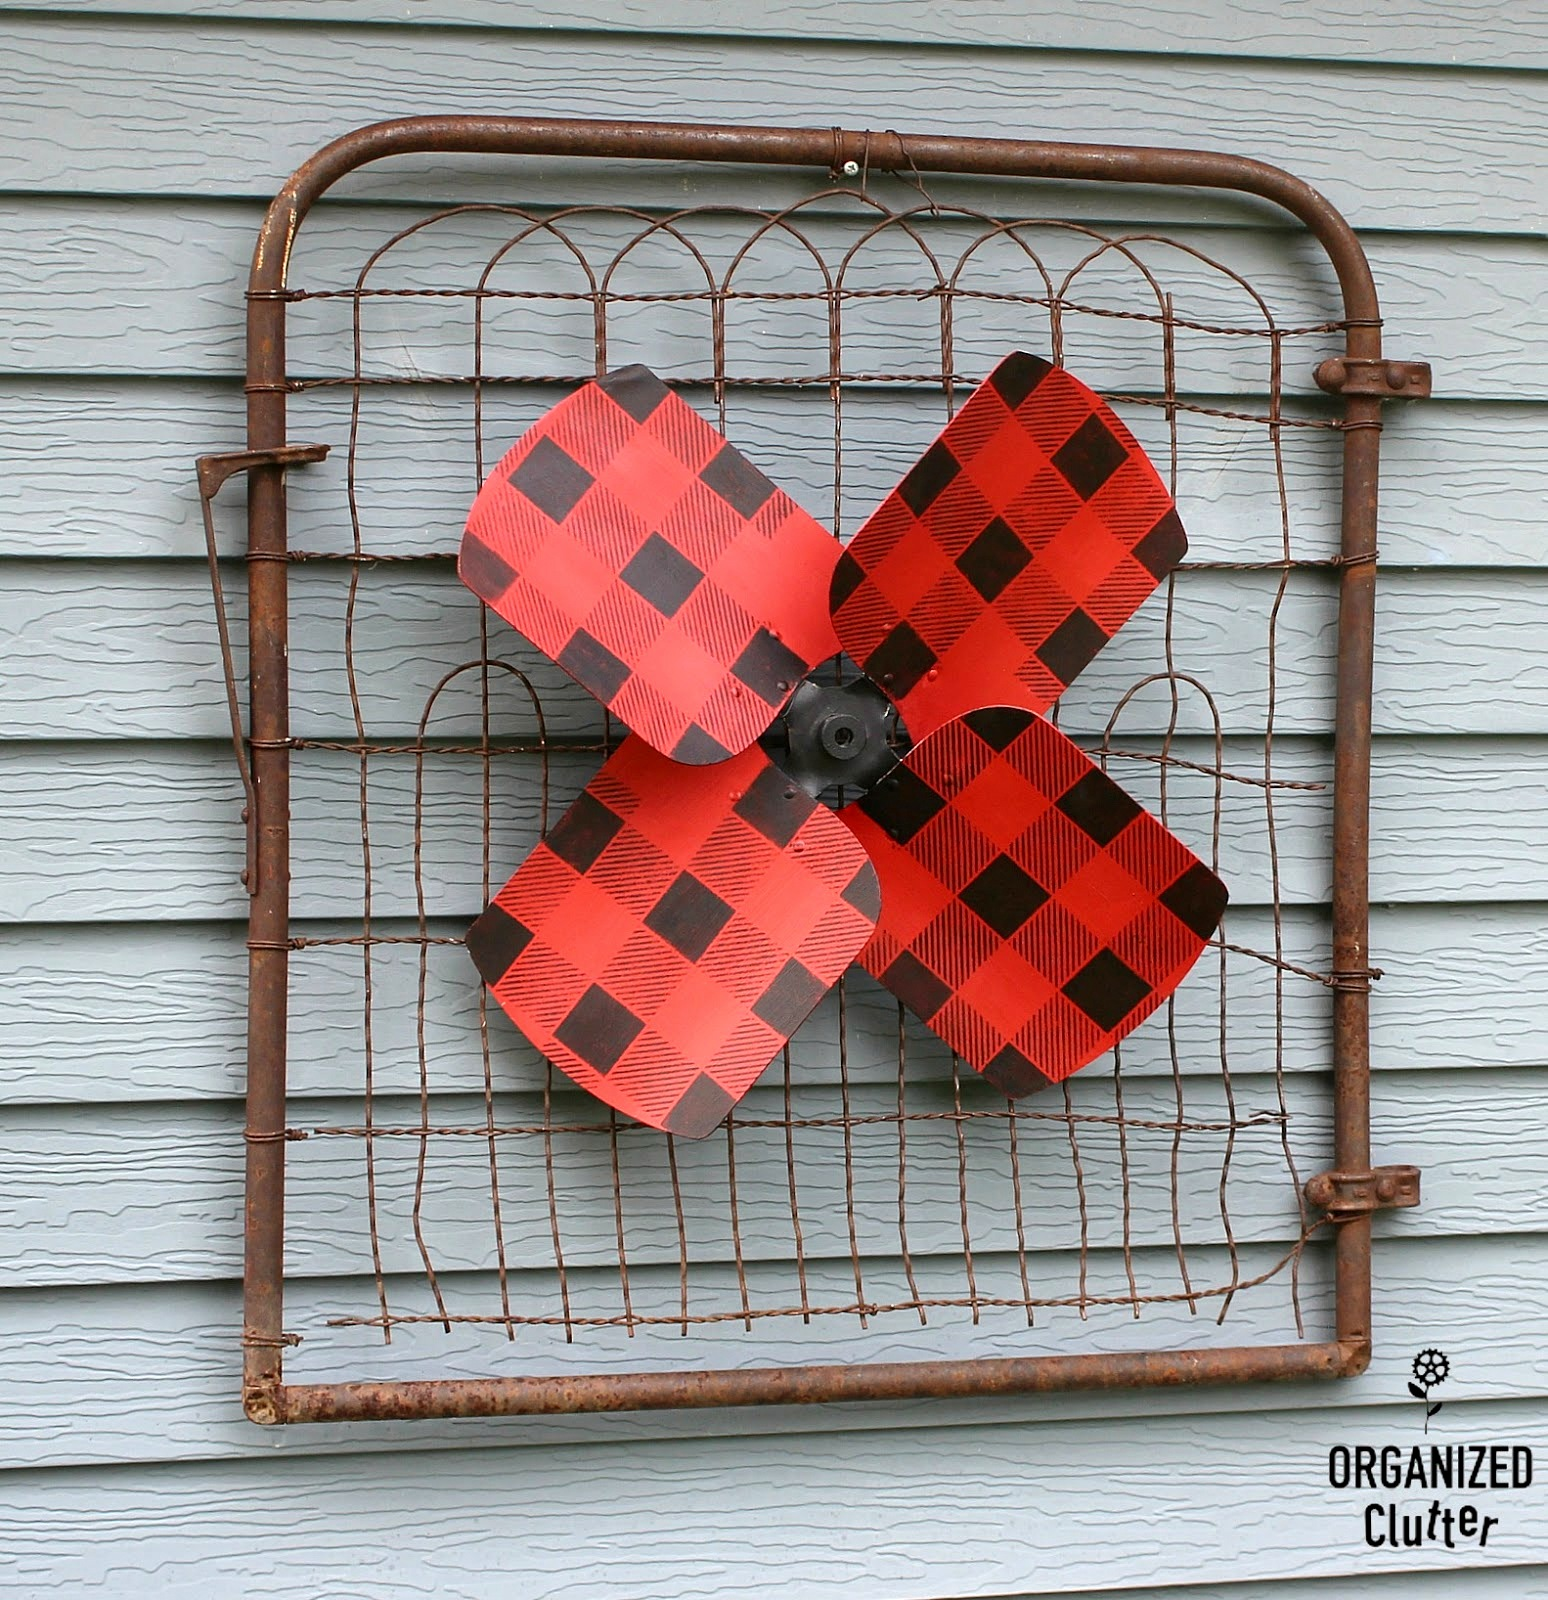 Buffalo Checked fan blade garden art by Organized Clutter, featured on Funky Junk Interiors